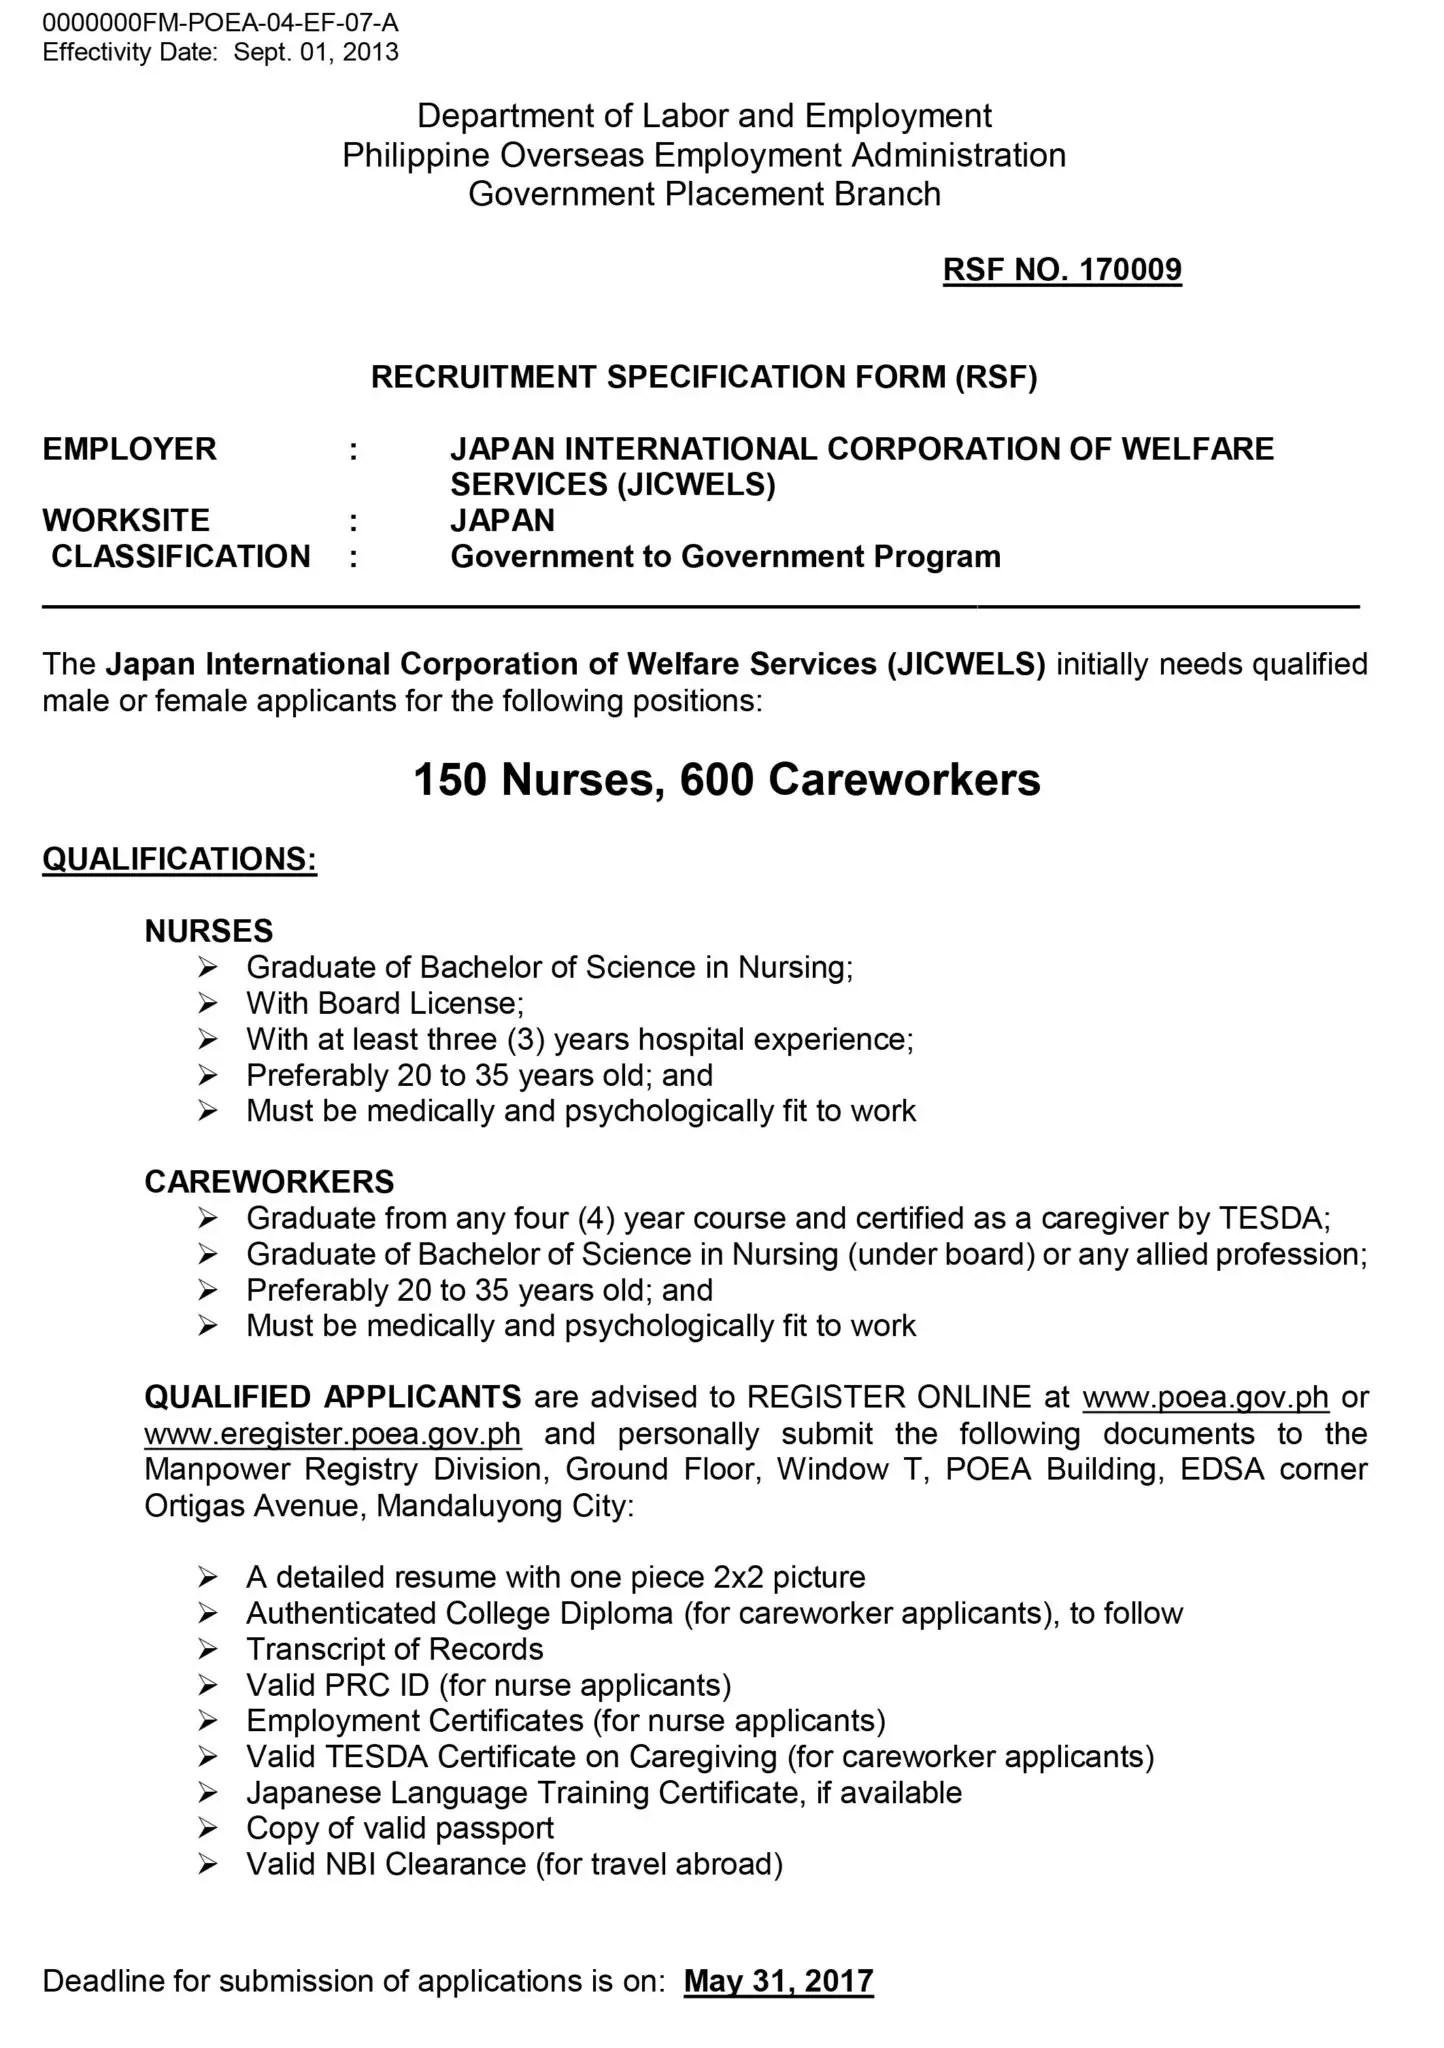 Resume Format Working Abroad Eliolera